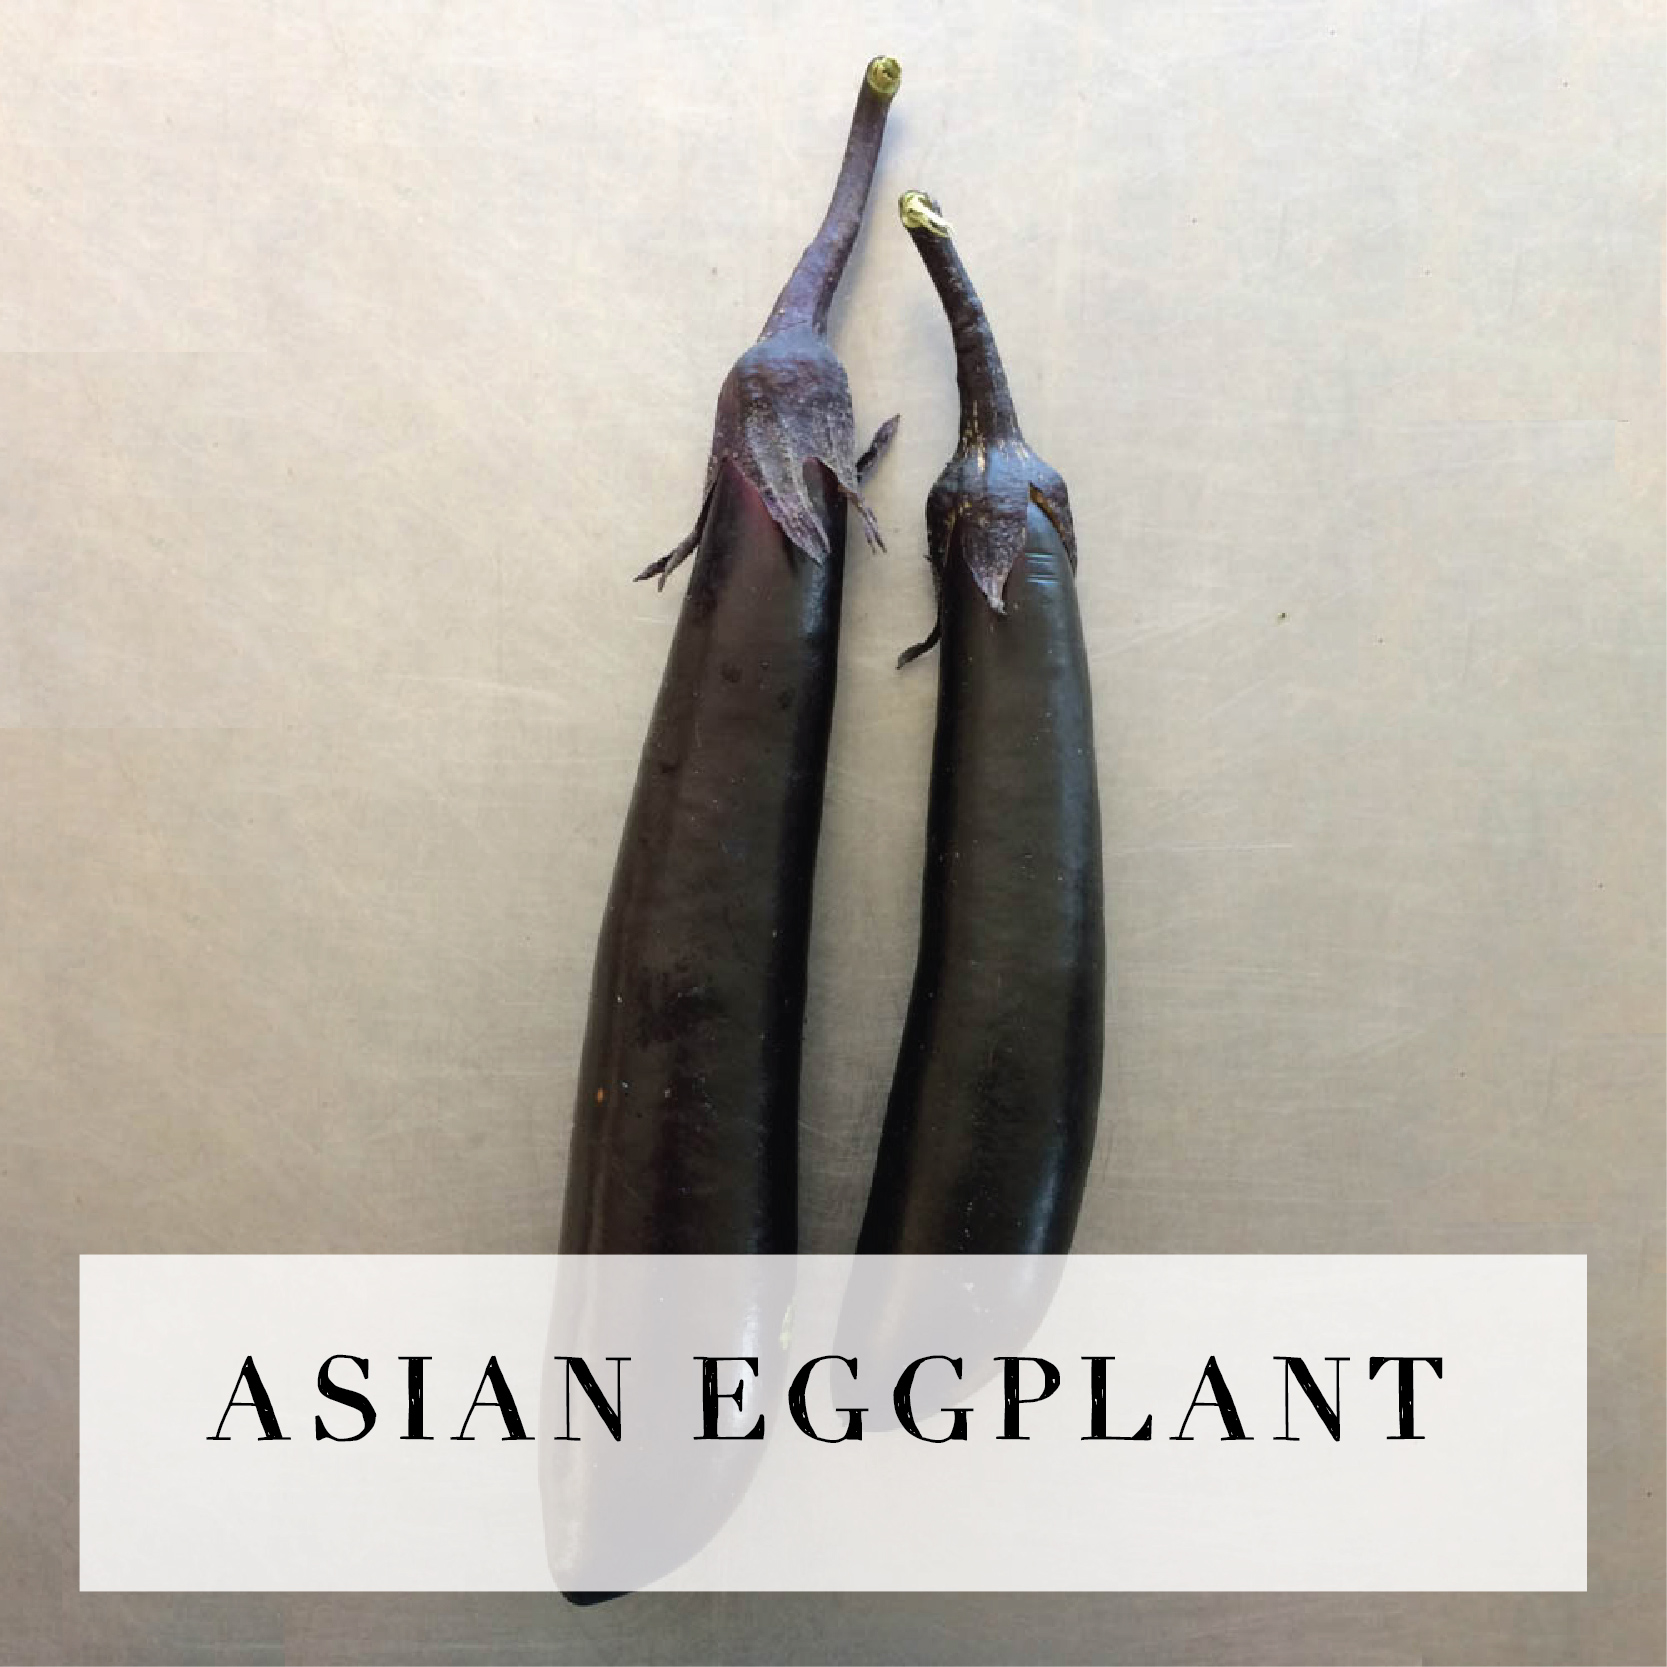 asianeggplant.jpg